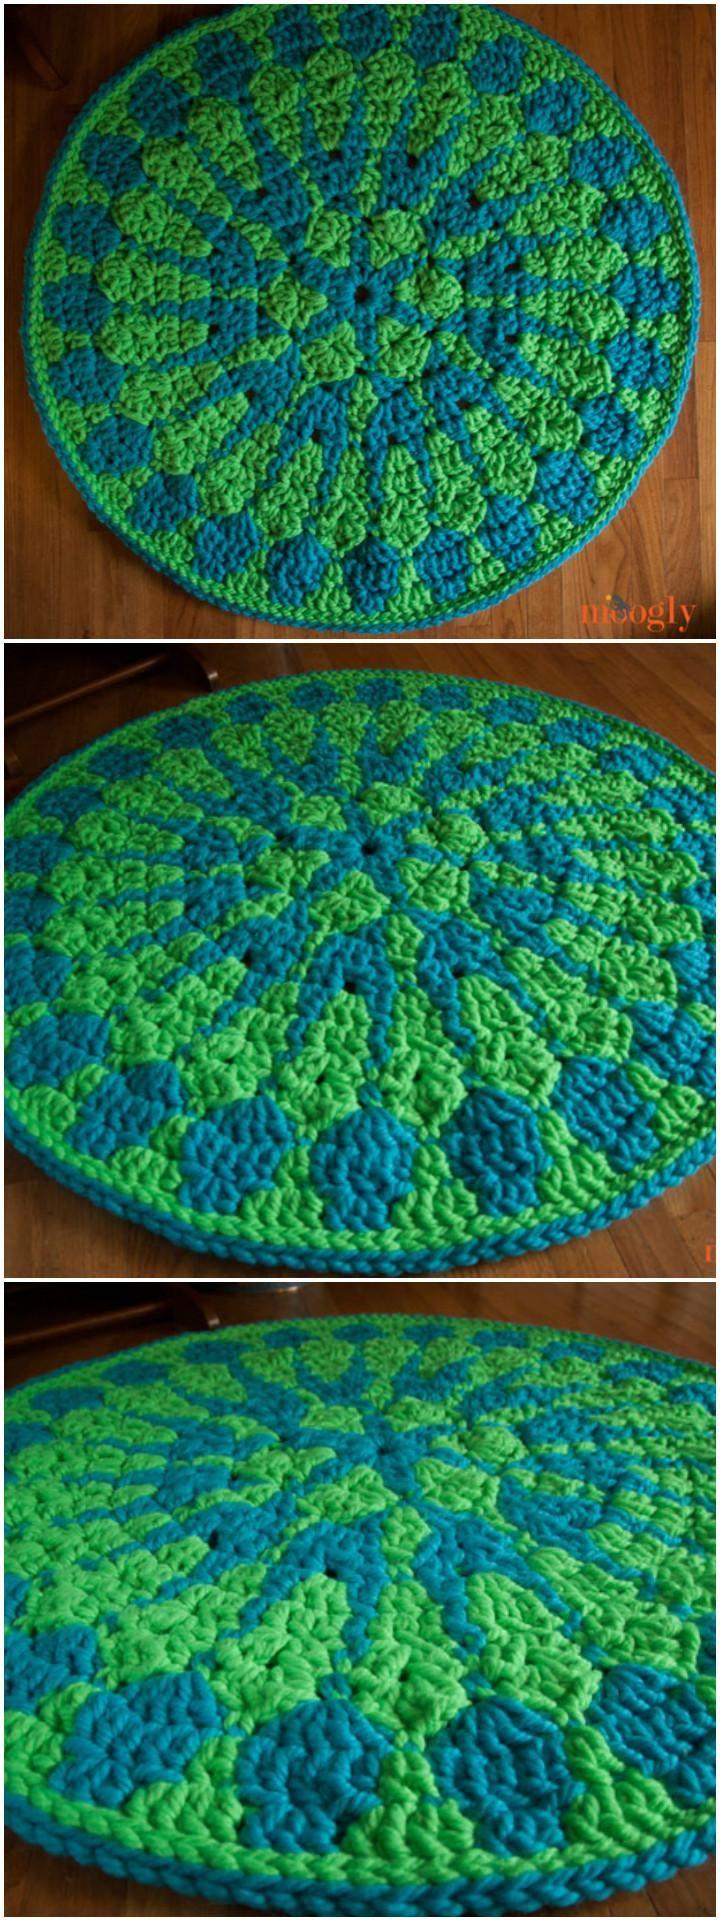 60+ Free Crochet Mandala Patterns - Page 5 of 12 | Mandalas y Ganchillo